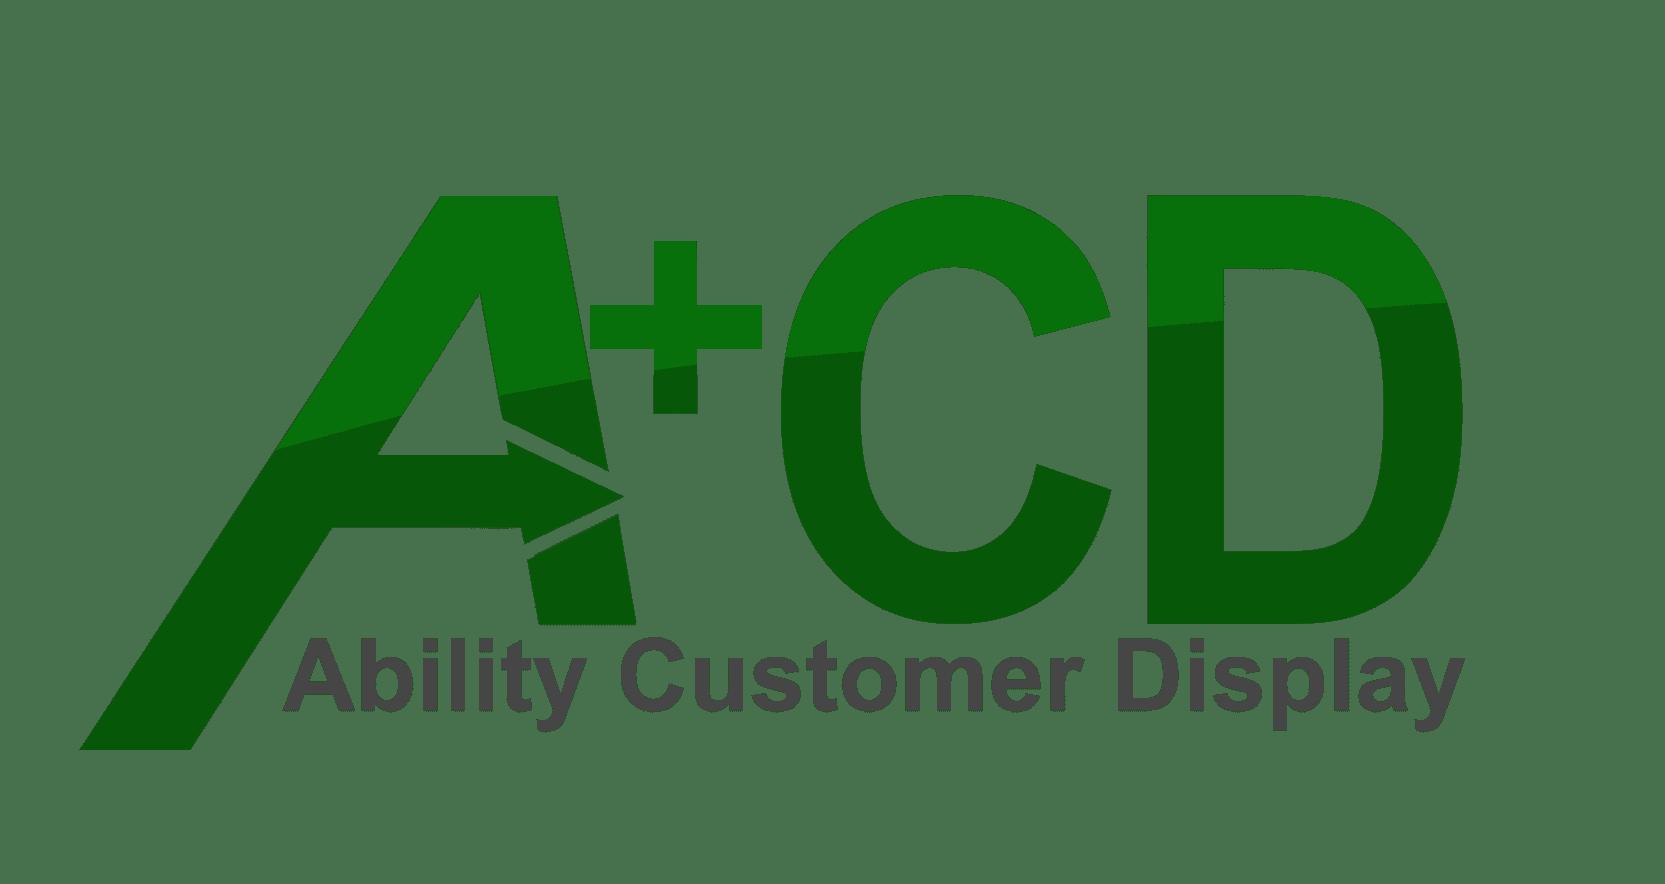 Ability Custoemr Display - Signature Capture